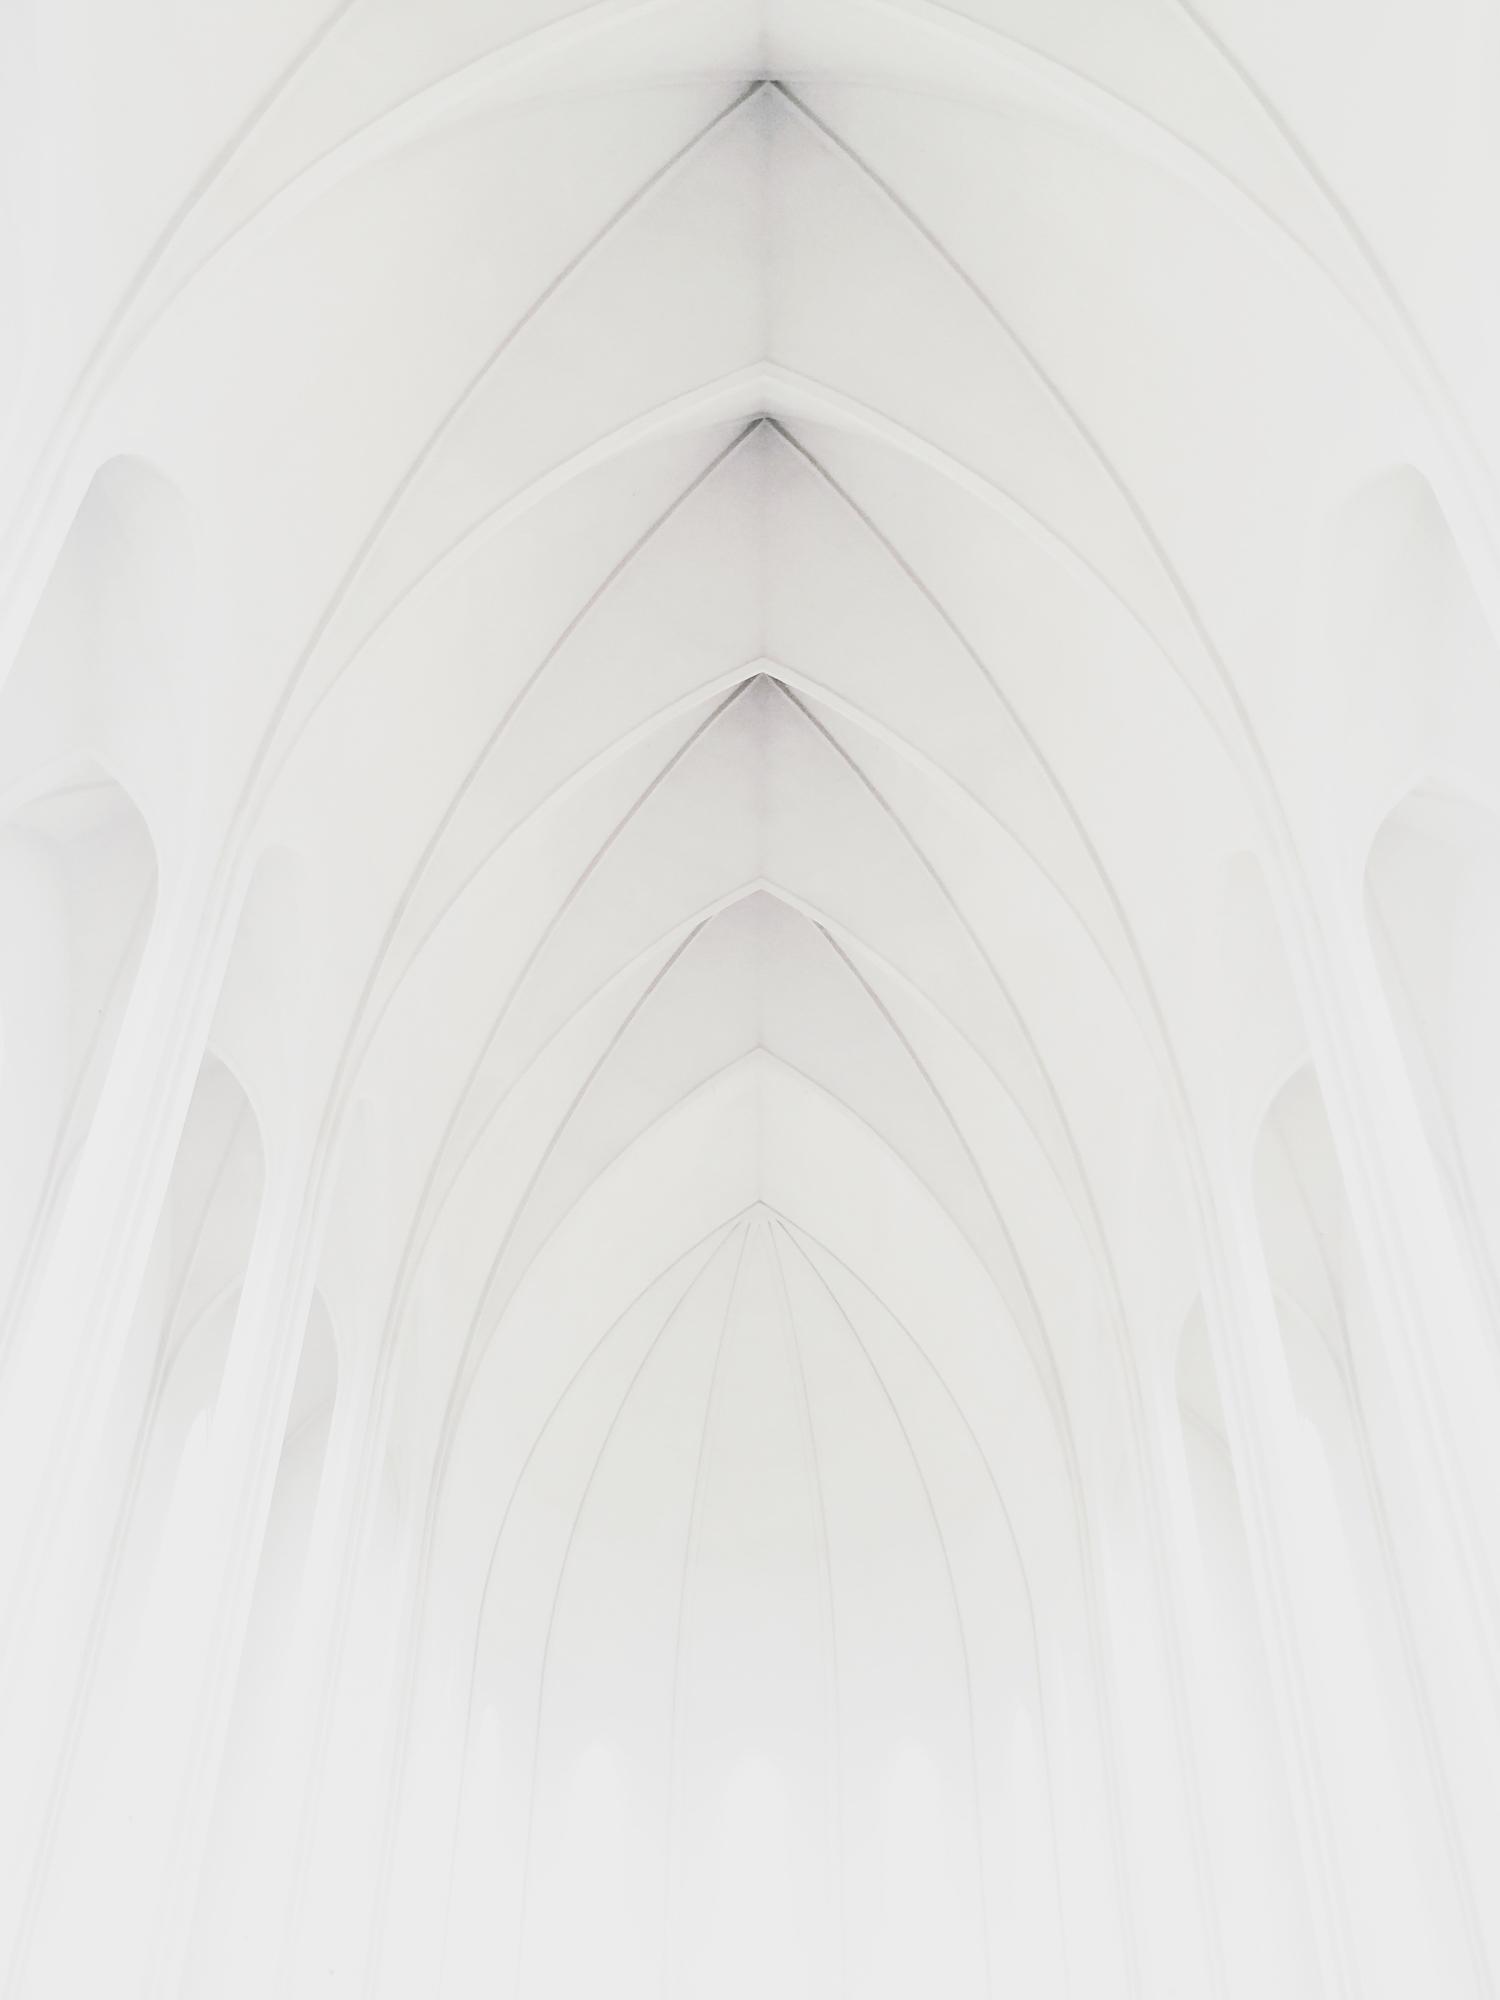 46. Doug Klembara, Hallgrímskirkja Cathedral.jpg